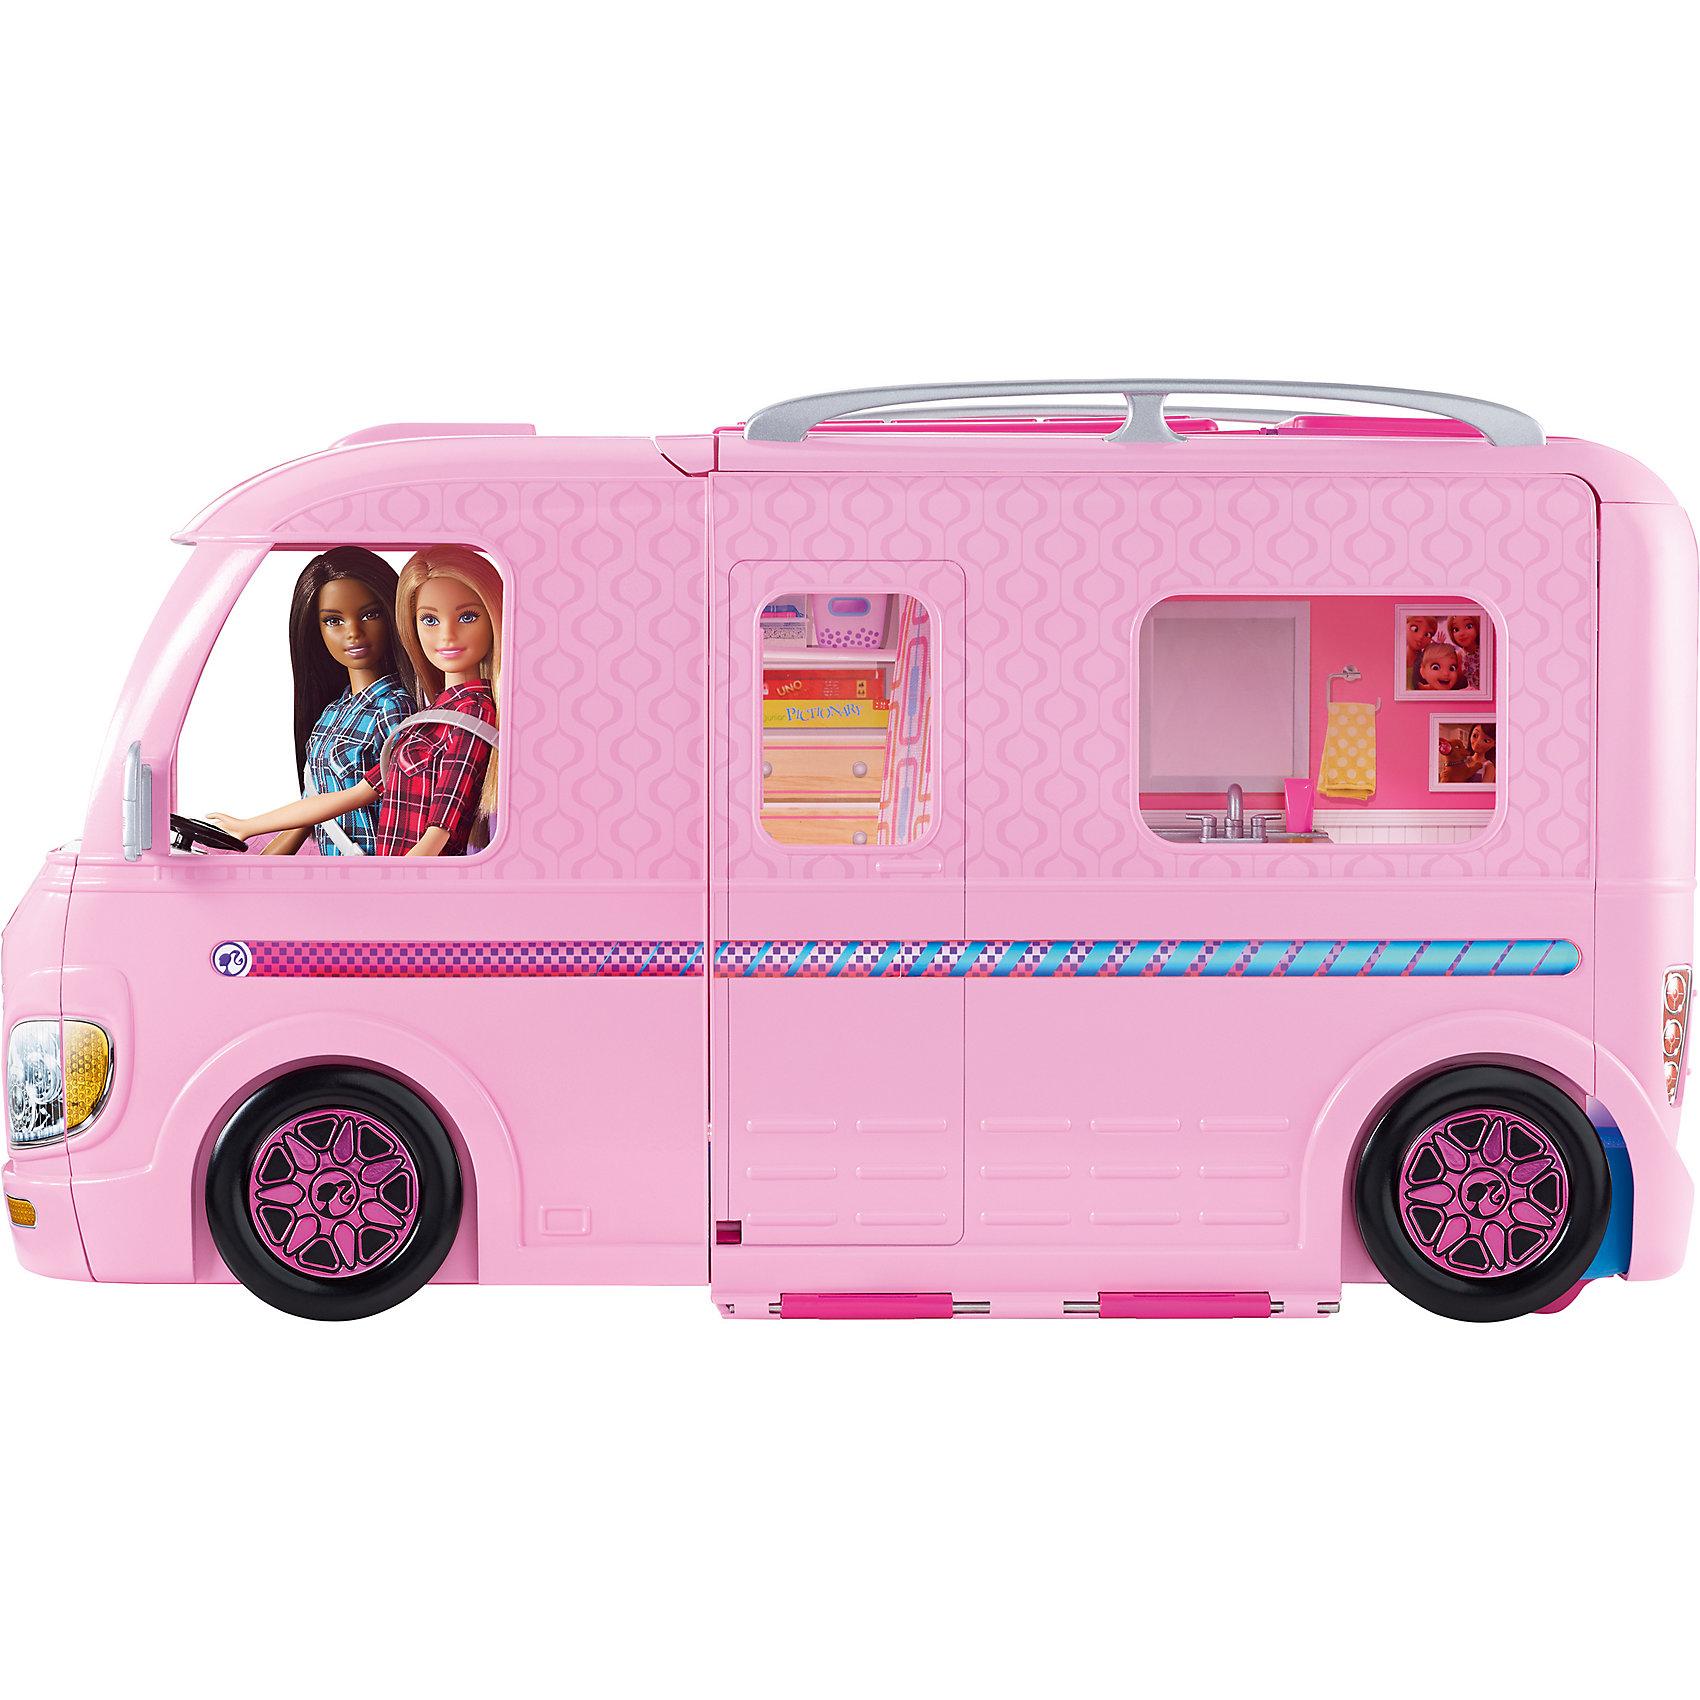 Волшебный раскладной фургон BarbieBarbie<br><br><br>Ширина мм: 610<br>Глубина мм: 246<br>Высота мм: 350<br>Вес г: 5482<br>Возраст от месяцев: 36<br>Возраст до месяцев: 72<br>Пол: Женский<br>Возраст: Детский<br>SKU: 6739665